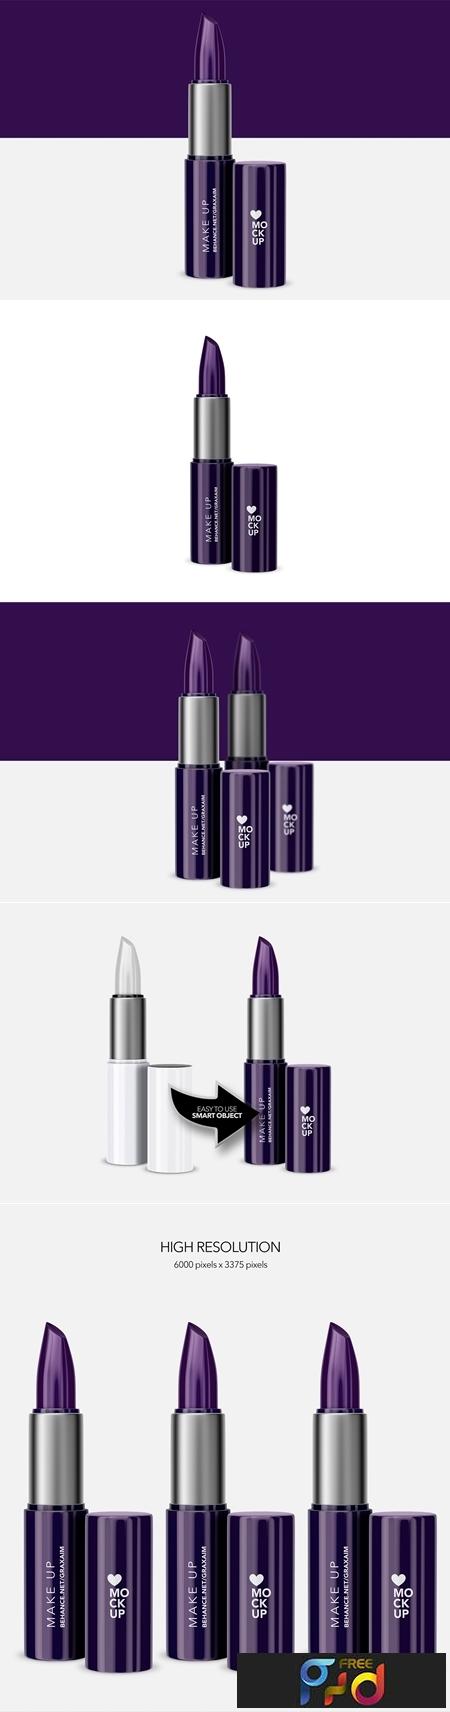 Cosmetics Lipstick Mockup - Make up 3702561 1